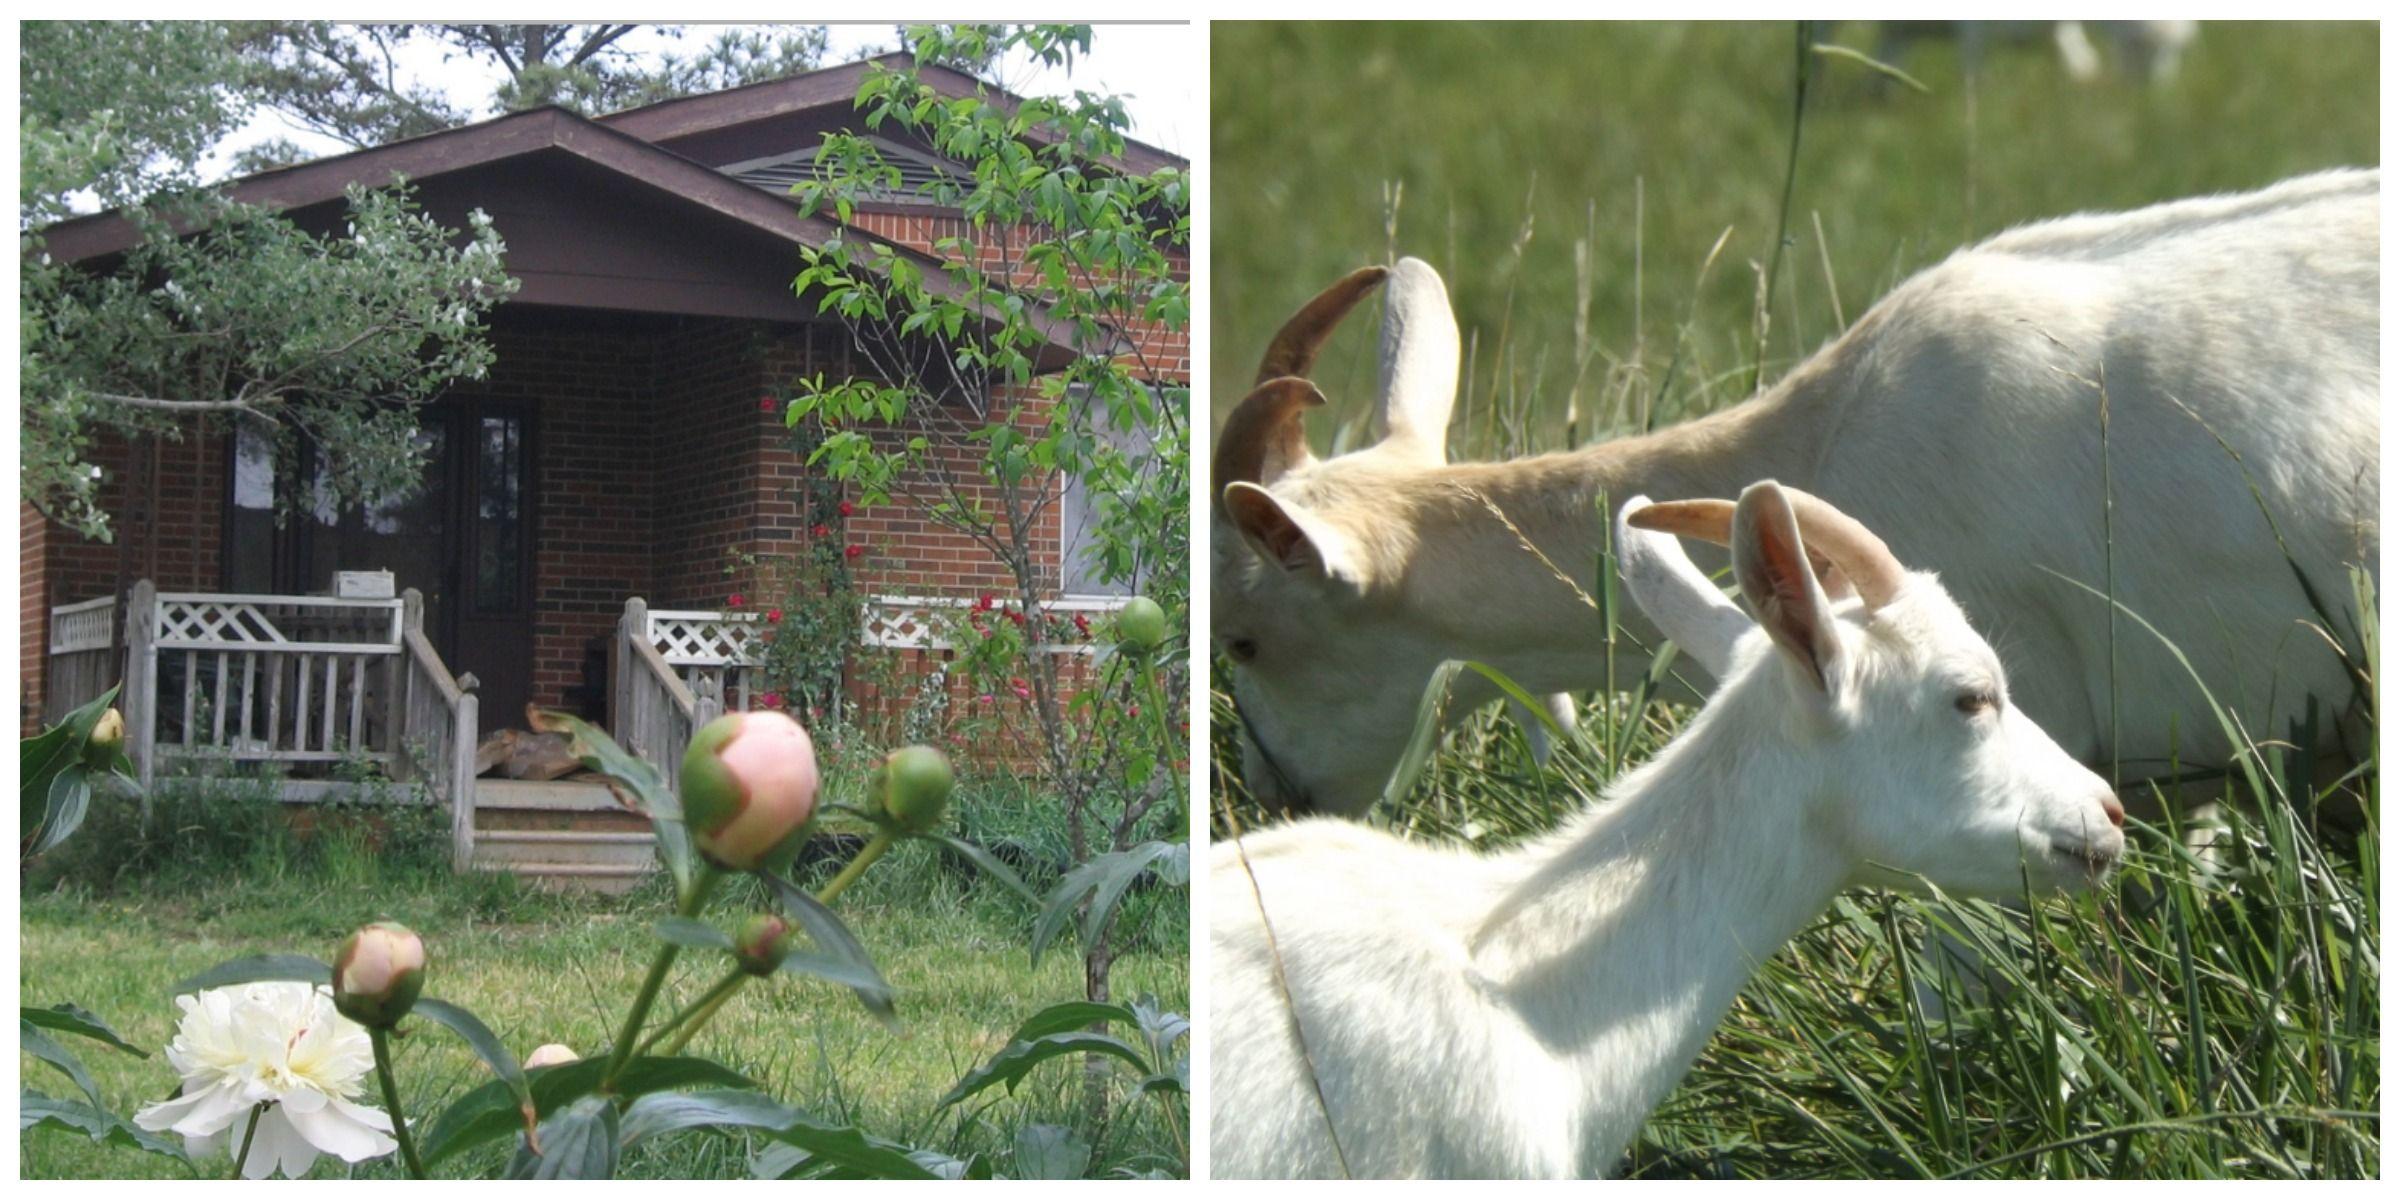 elkmont alabama goat farm essay